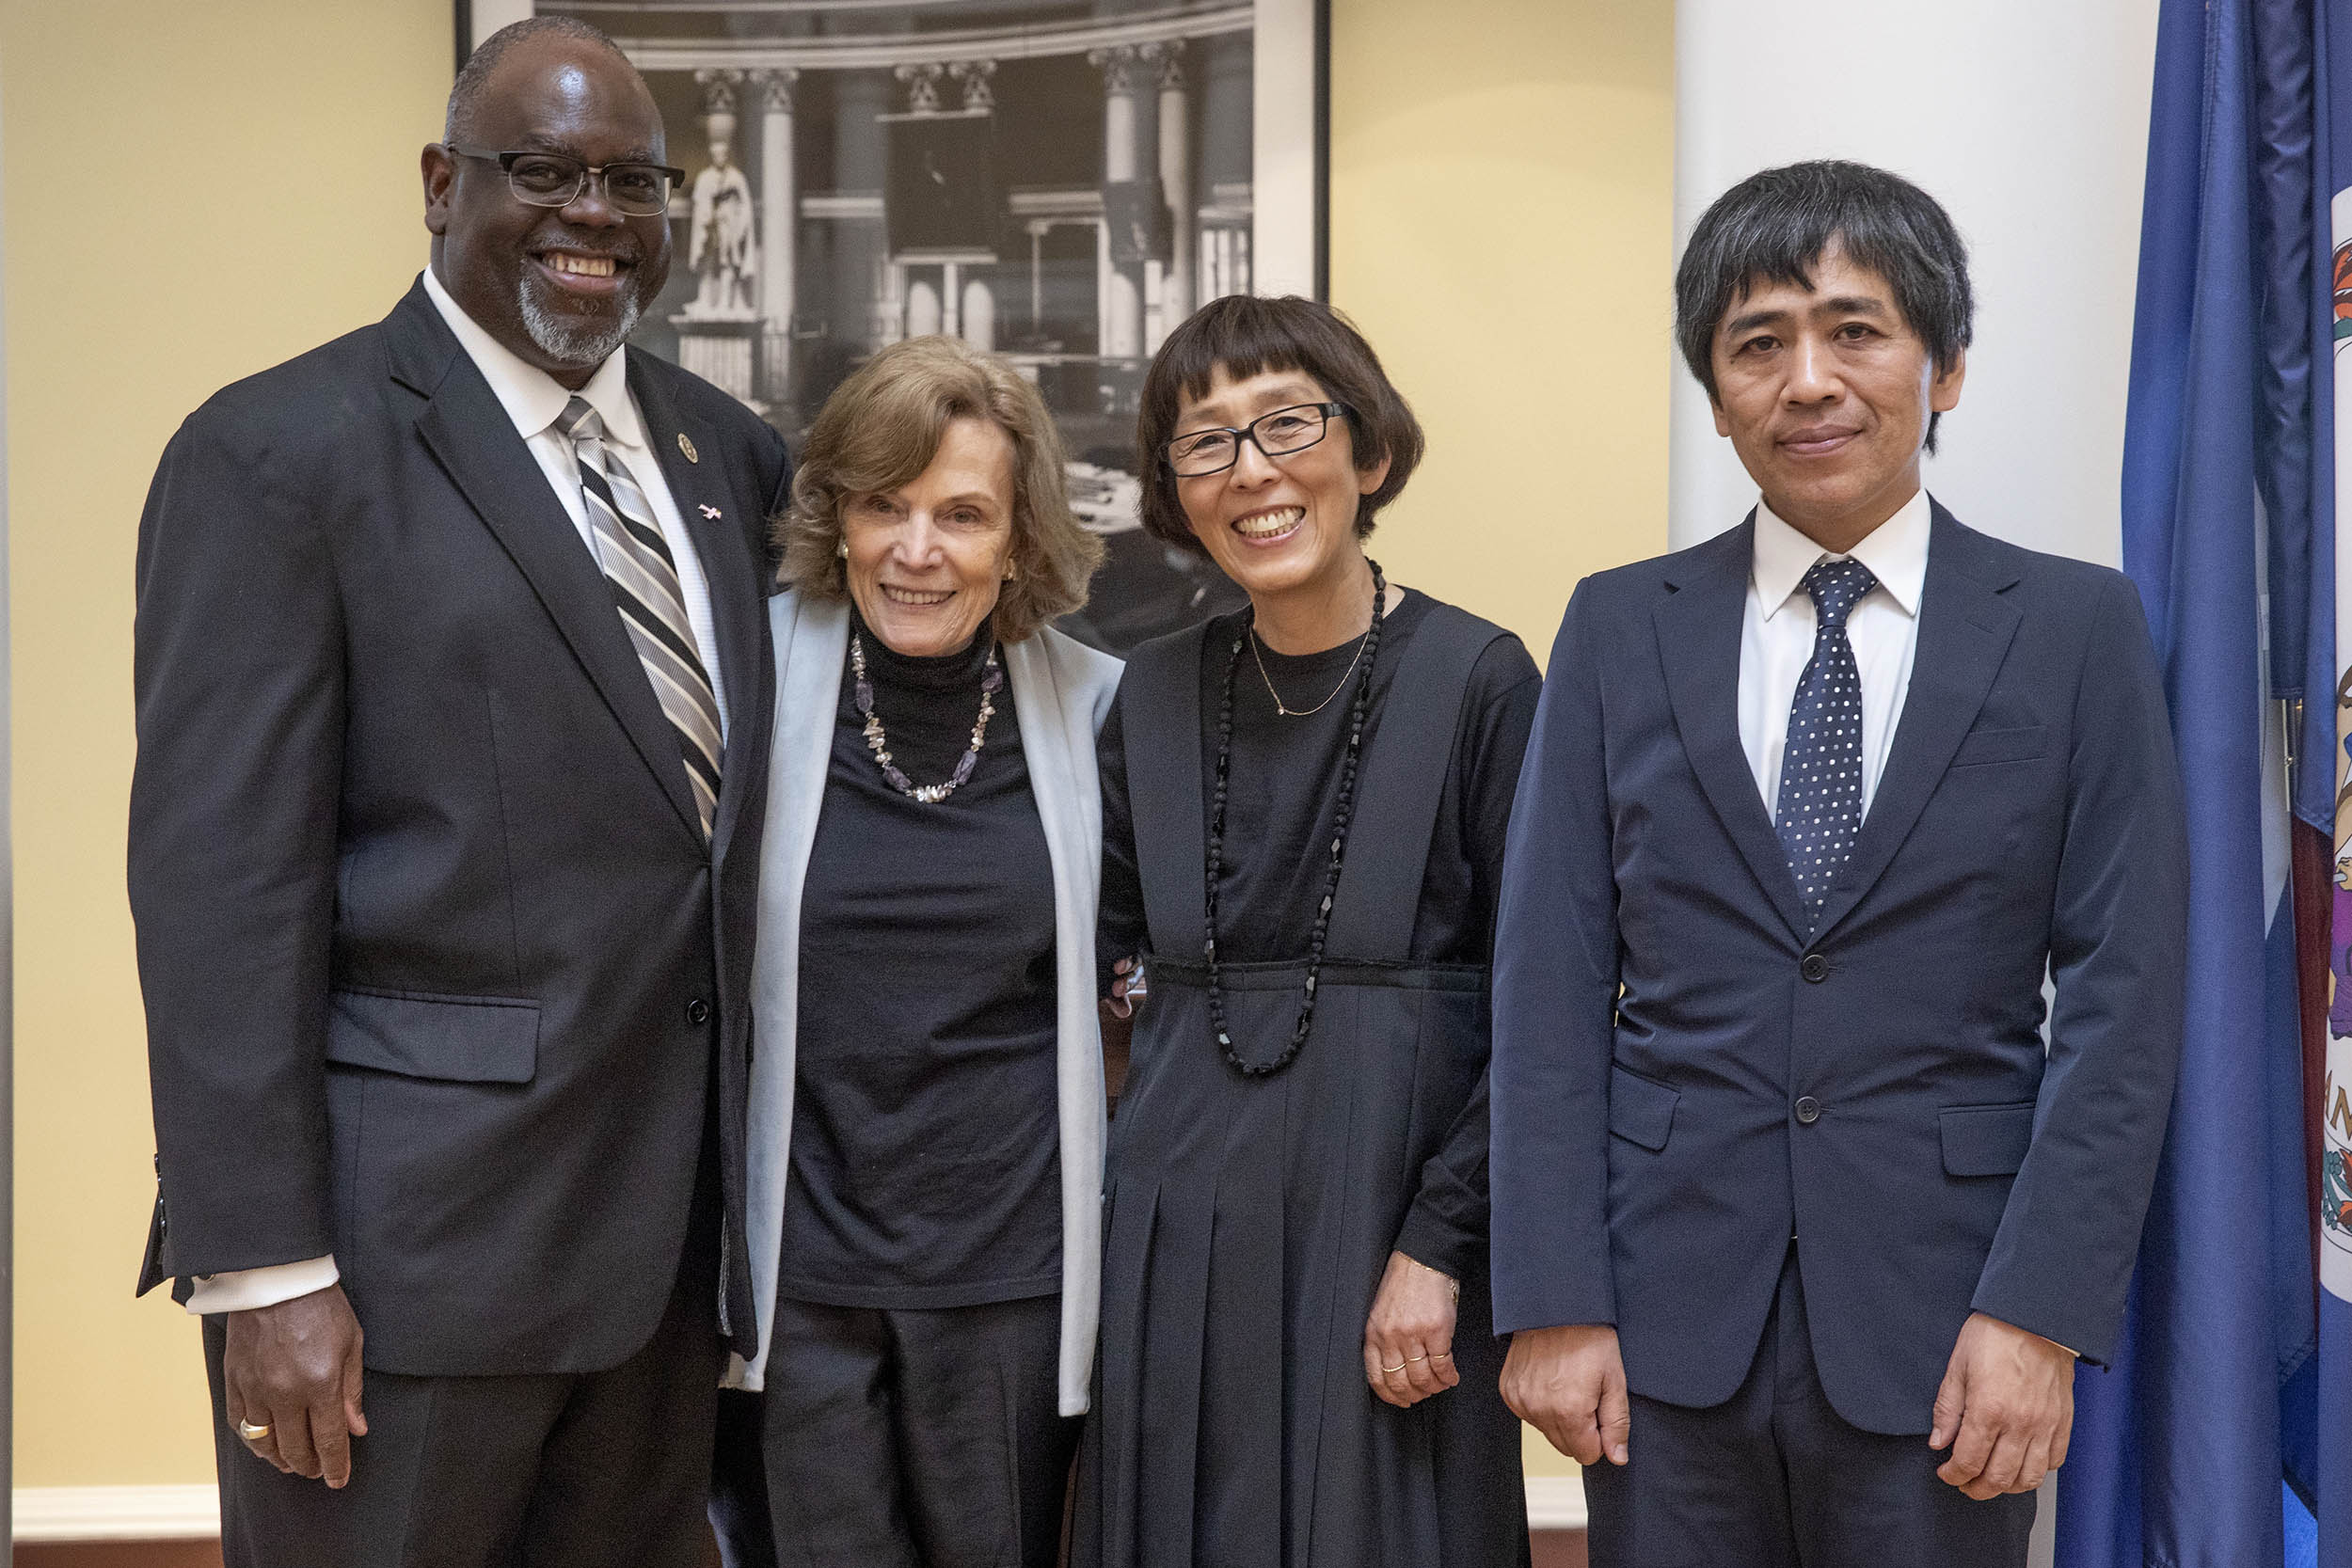 From left: U.S. Judge Carlton W. Reeves, oceanographer Sylvia Earle and architects Kazuyo Sejima and Ryue Nishizawa, the 2019 Thomas Jefferson Foundation Medalists.